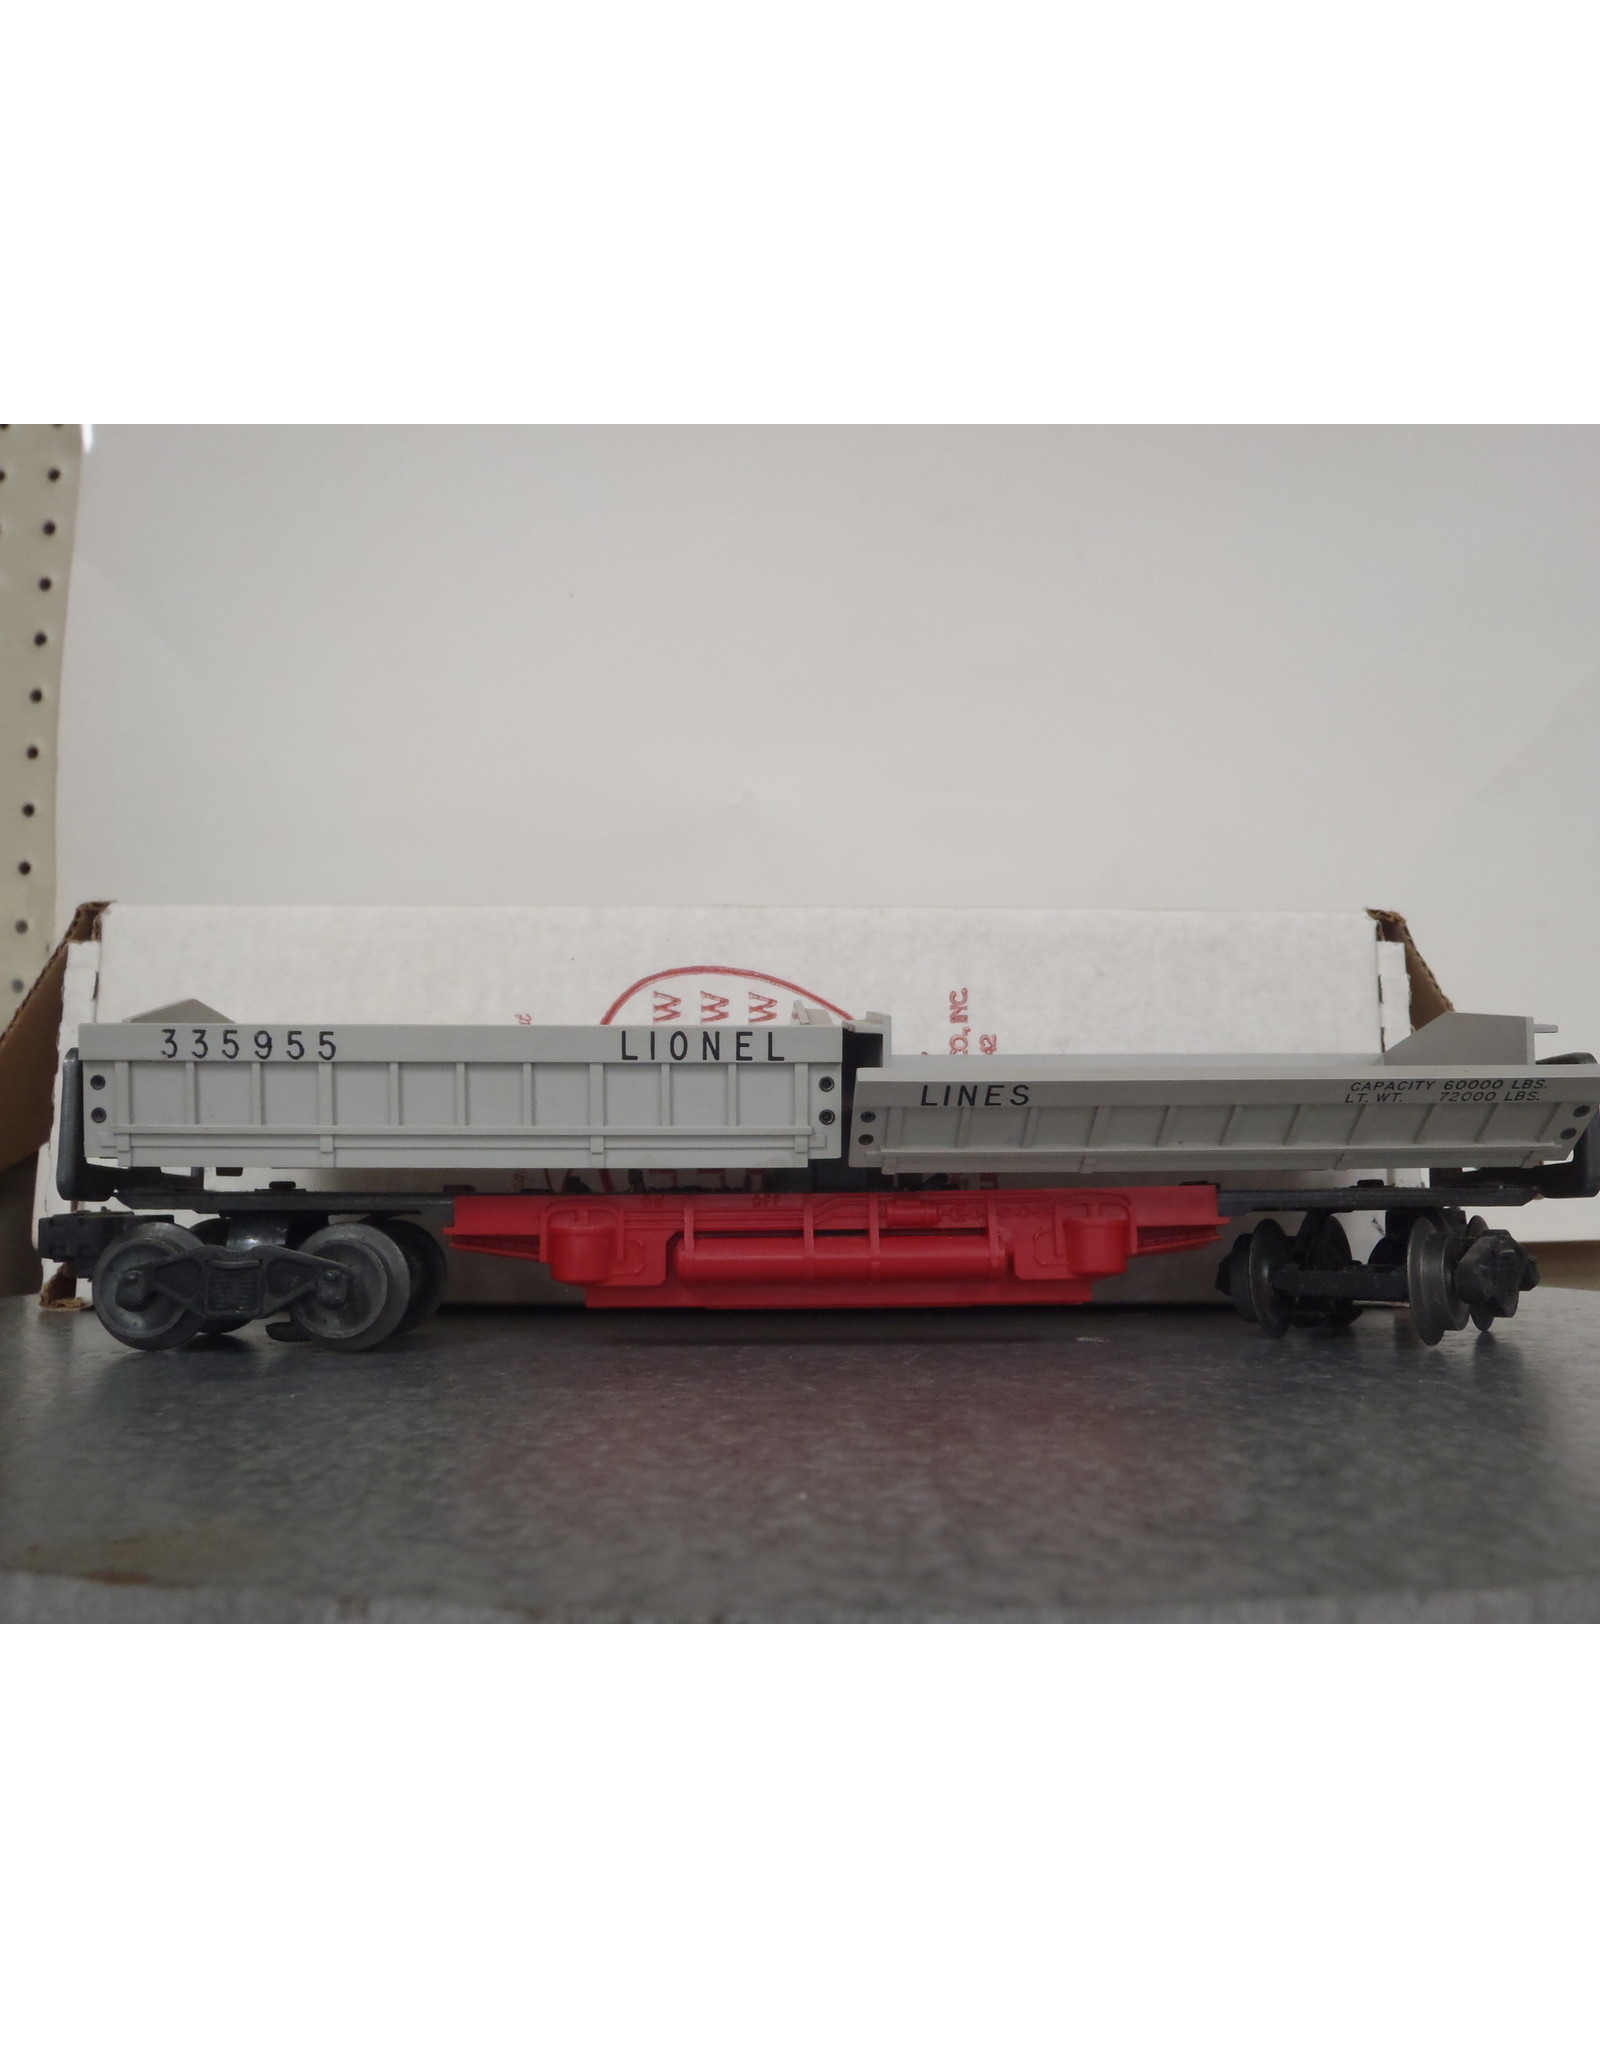 Lionel 2 Bay Coal Dump 335955